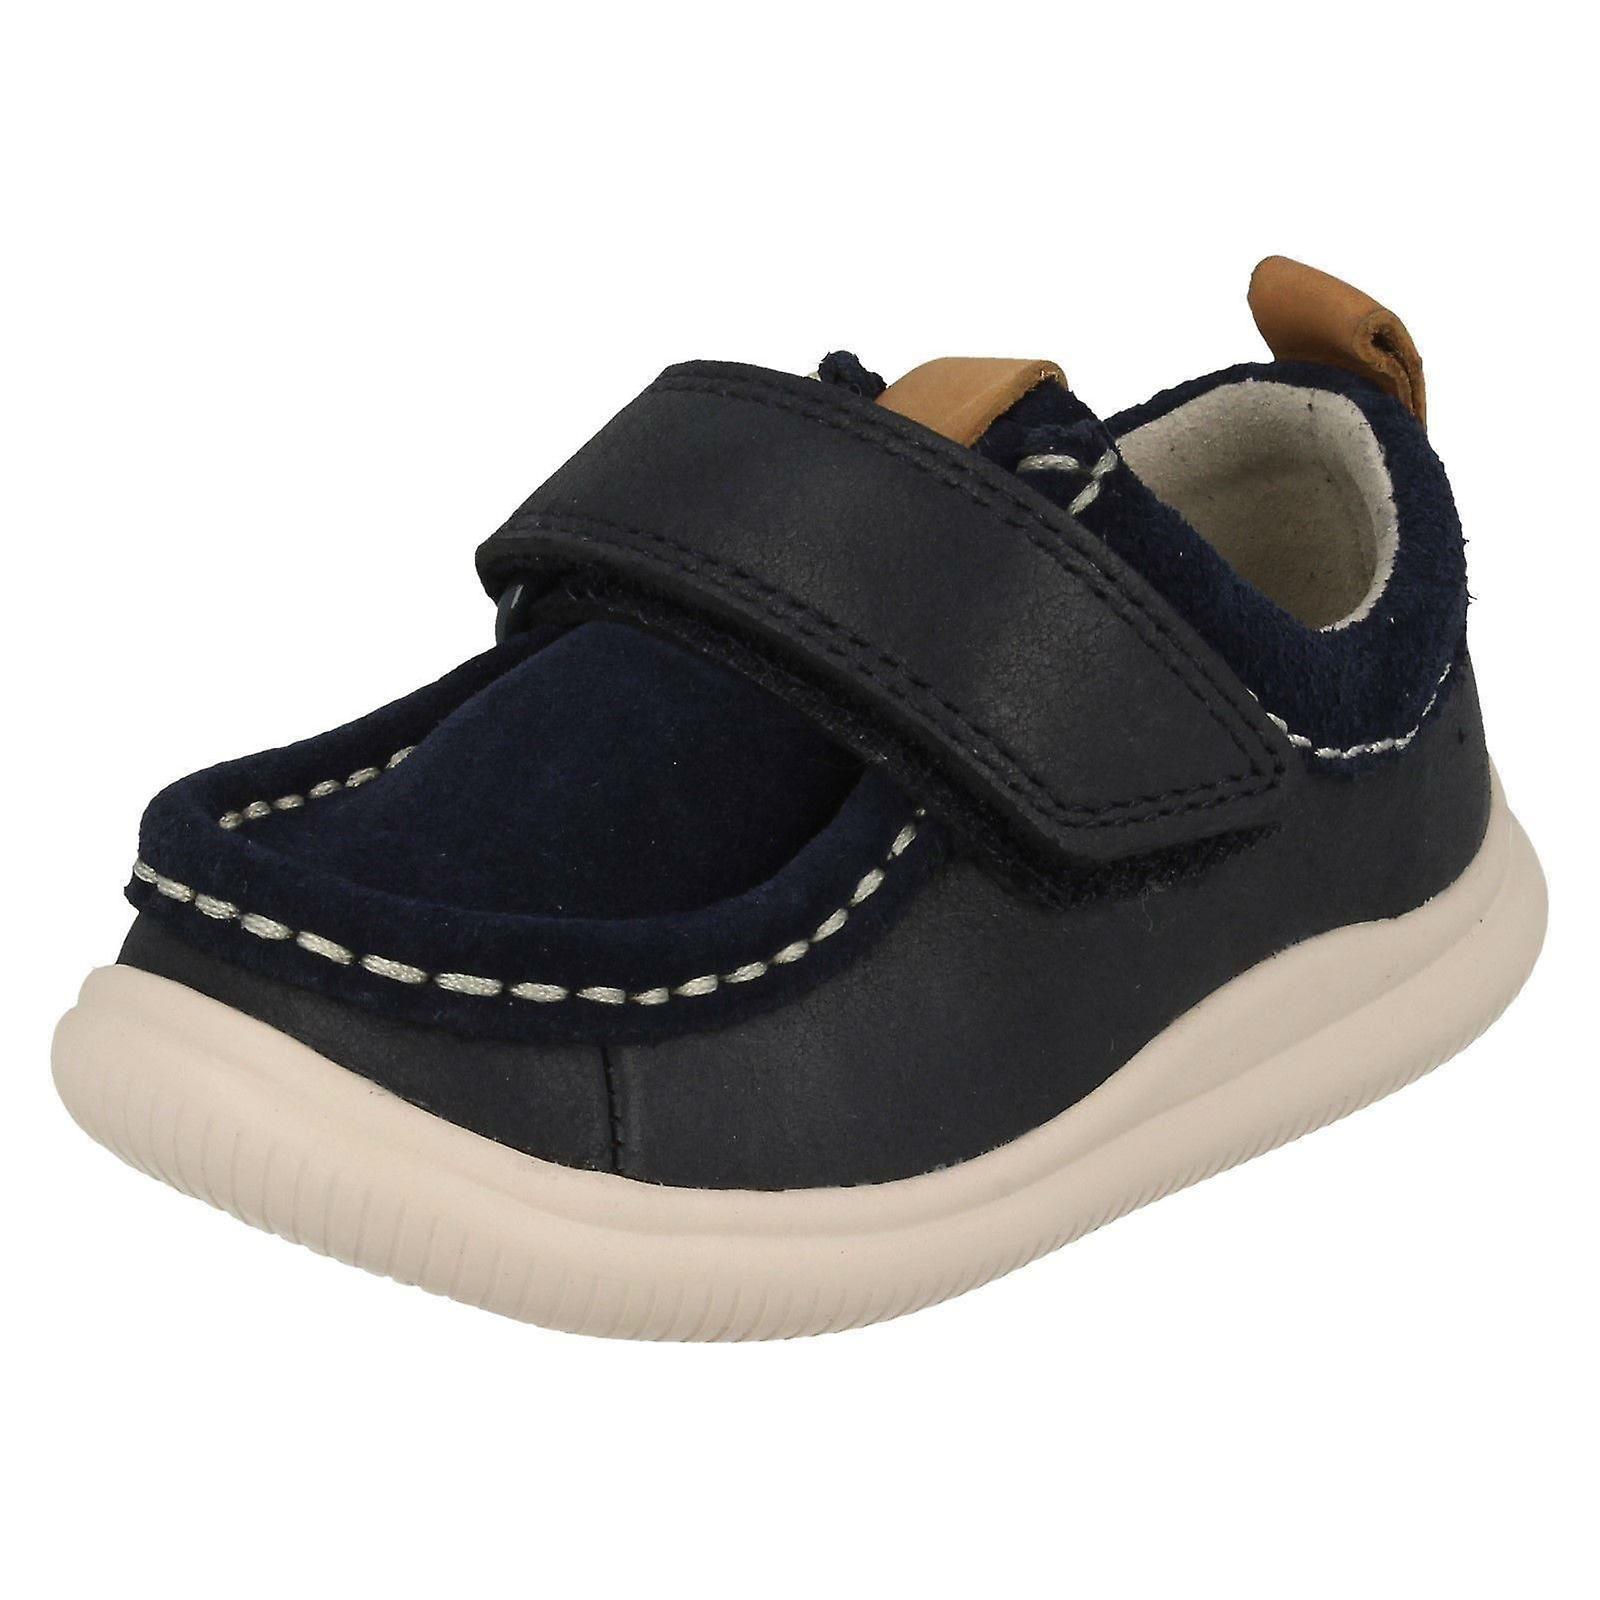 Boys Clarks Casual Shoes Cloud Cloud Cloud Sea 16ba0b